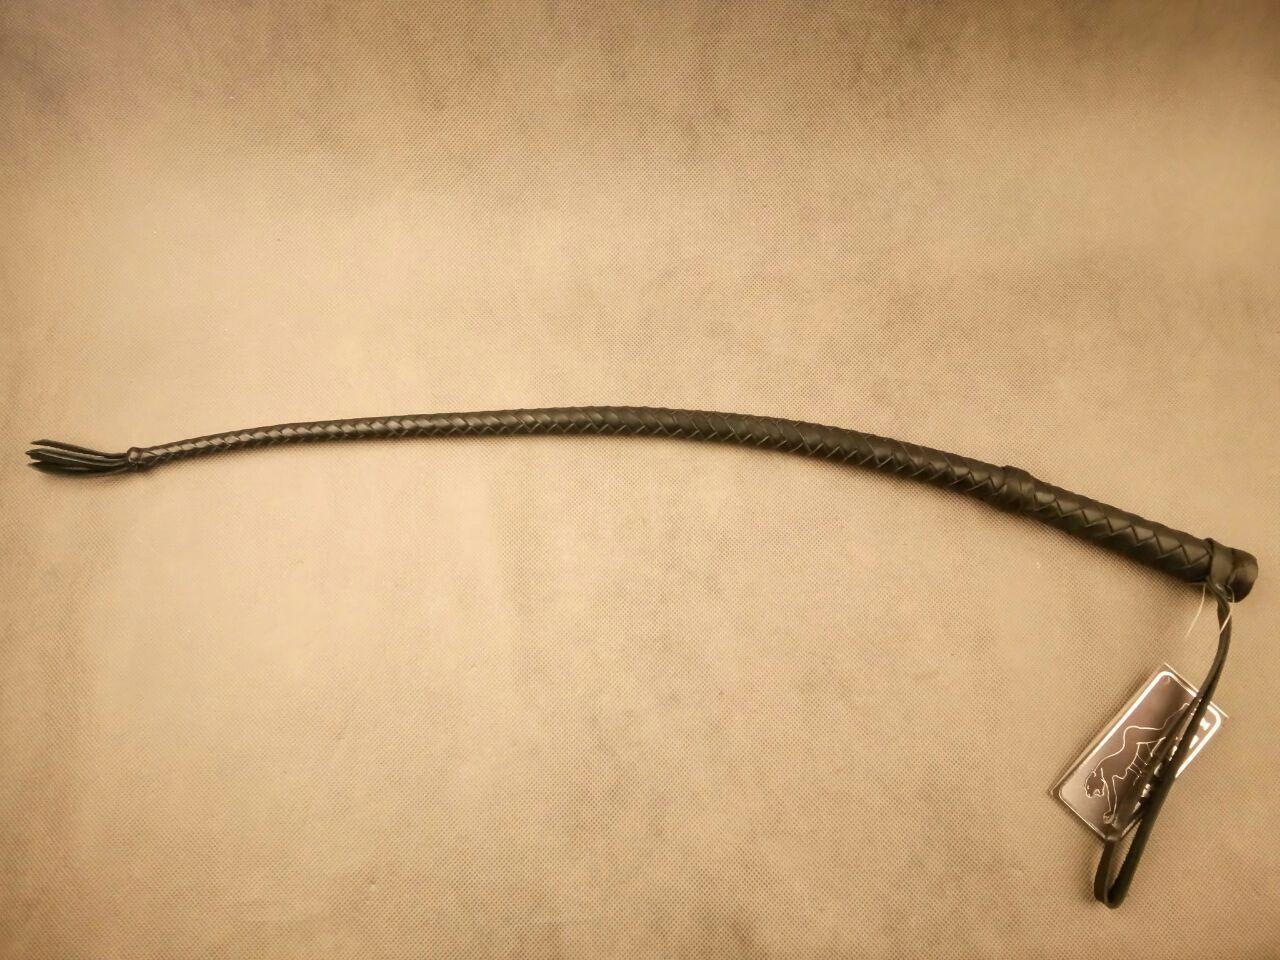 Genuine Leder Bull whip flogger crop nagayka nagayka nagayka 977bdd